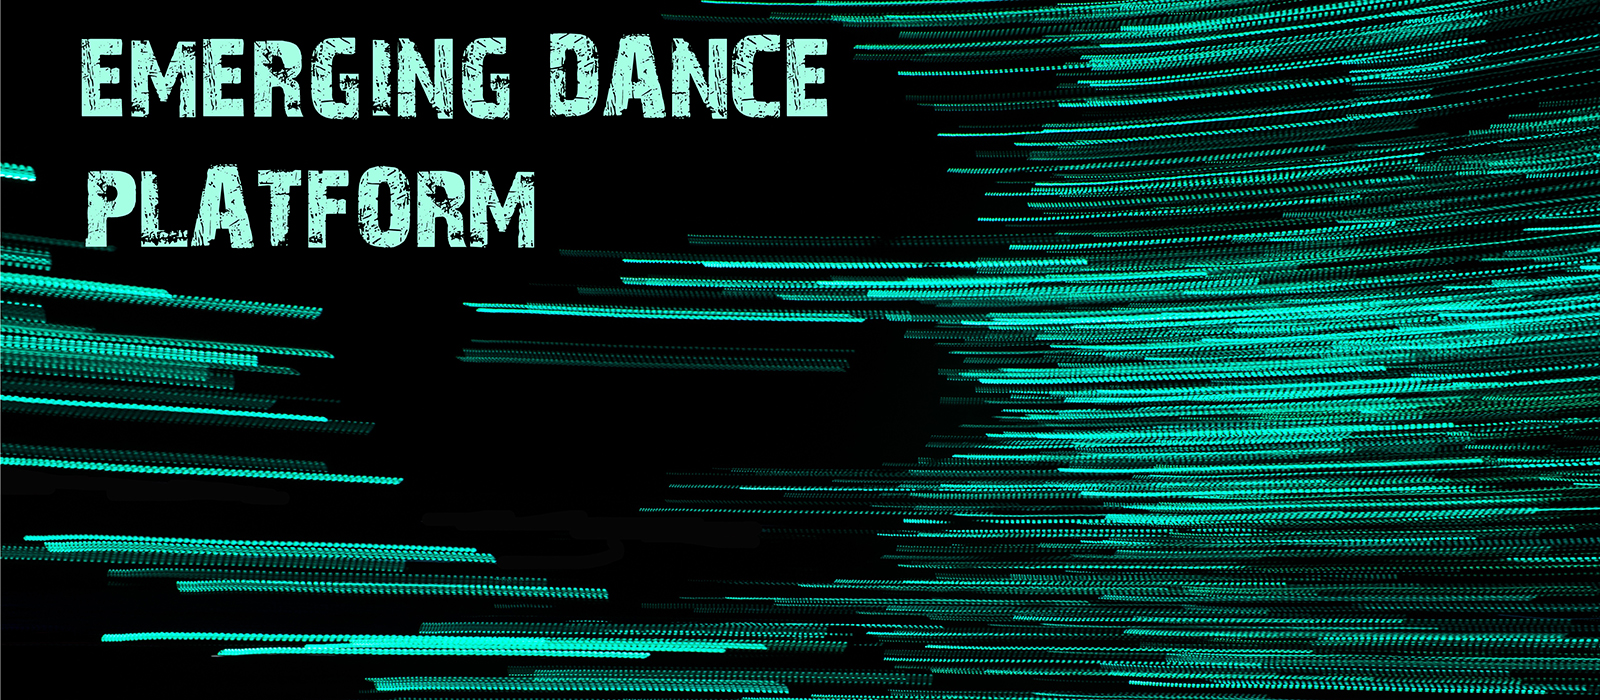 Emerging Dance Platform_1600x700.jpg